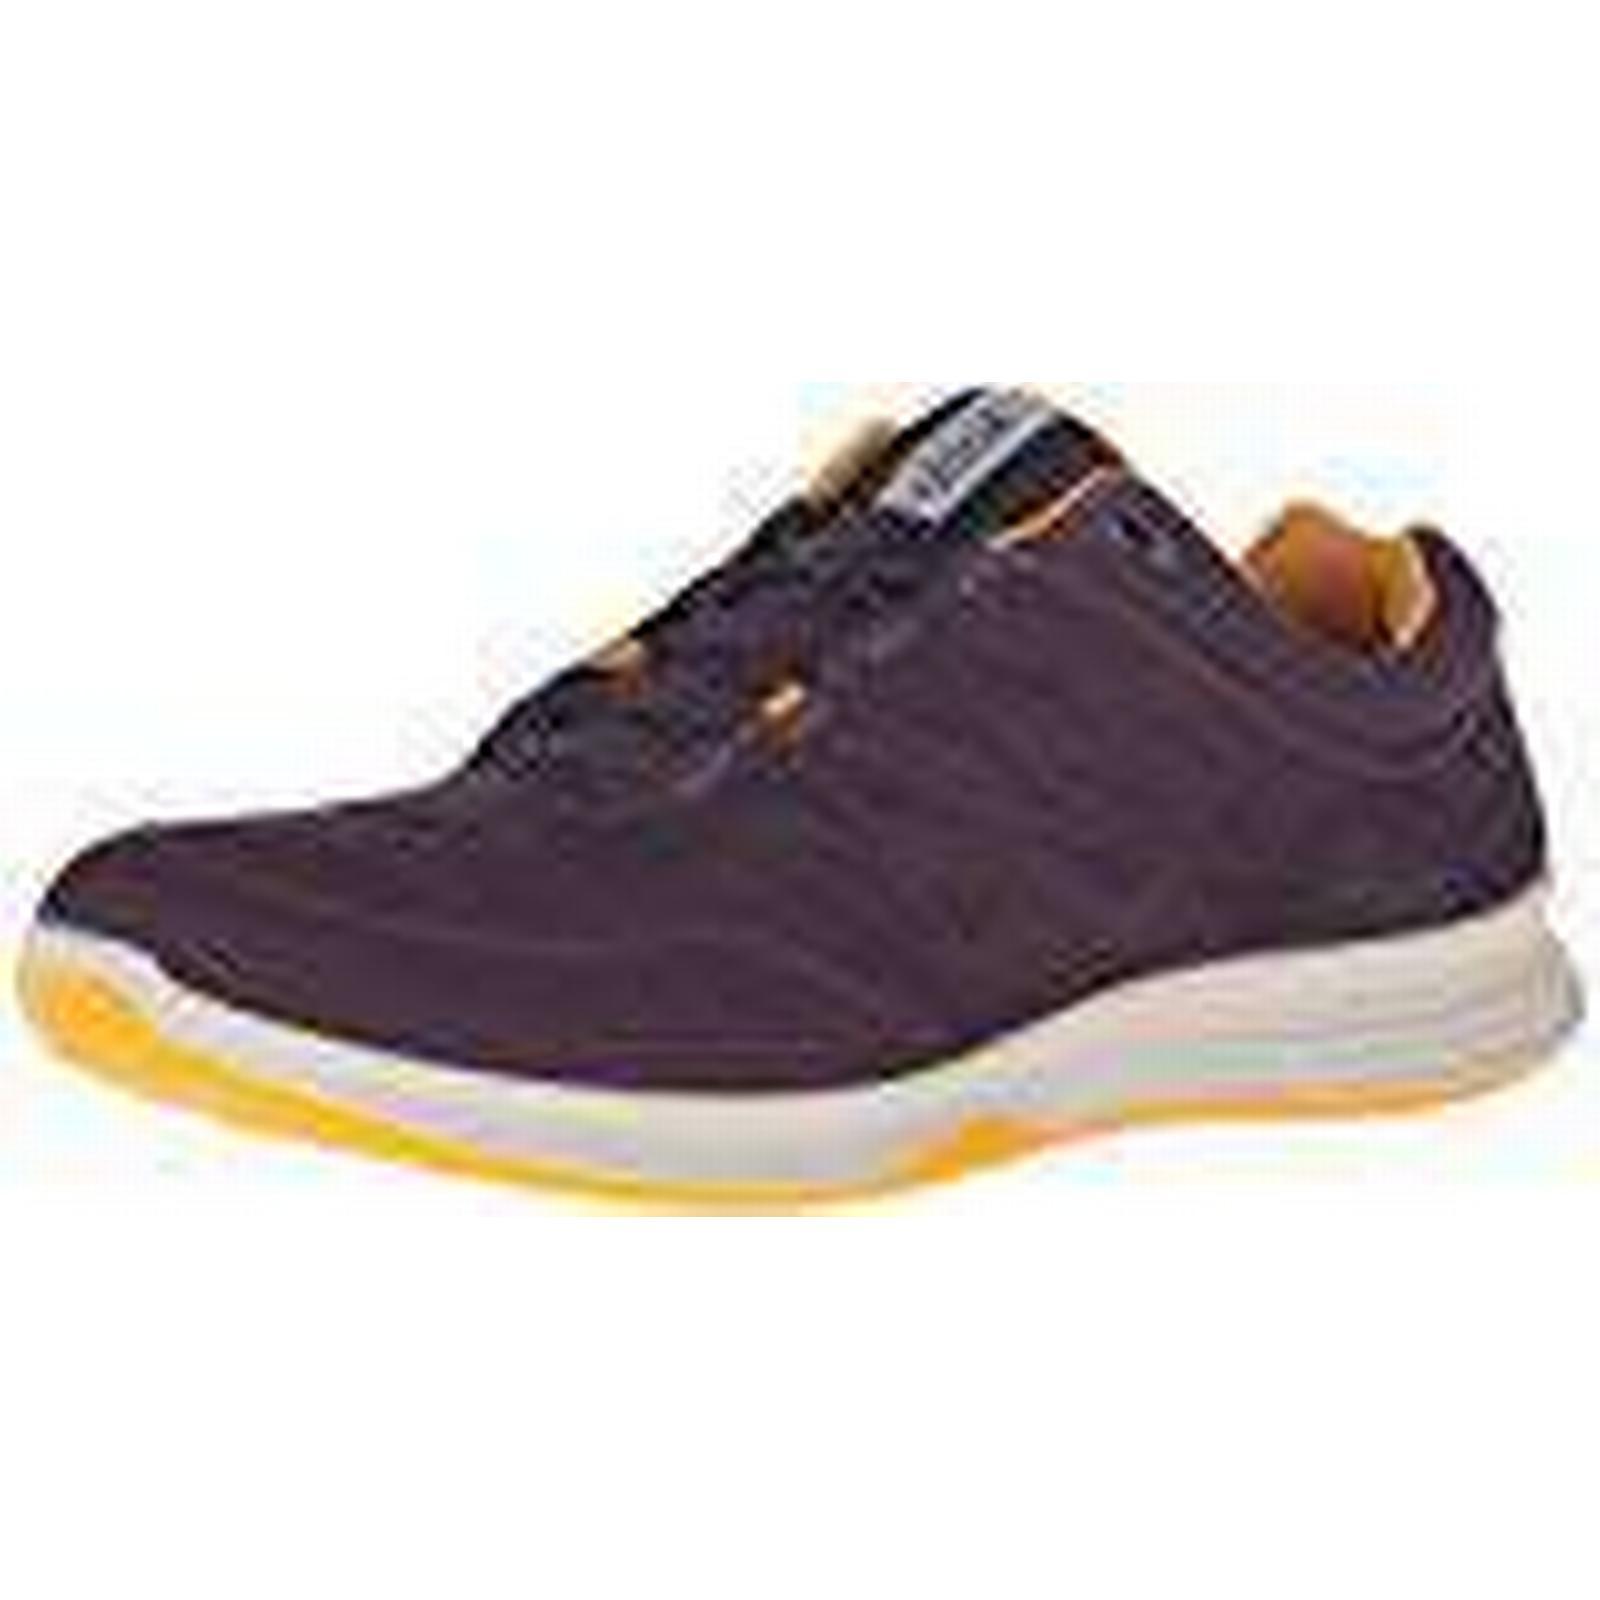 Ecco EXCEED, Women's Multisport Outdoor 7.5 Shoes, Violet (Mauve 2276), 7.5 Outdoor UK (41 EU) 34b1fc